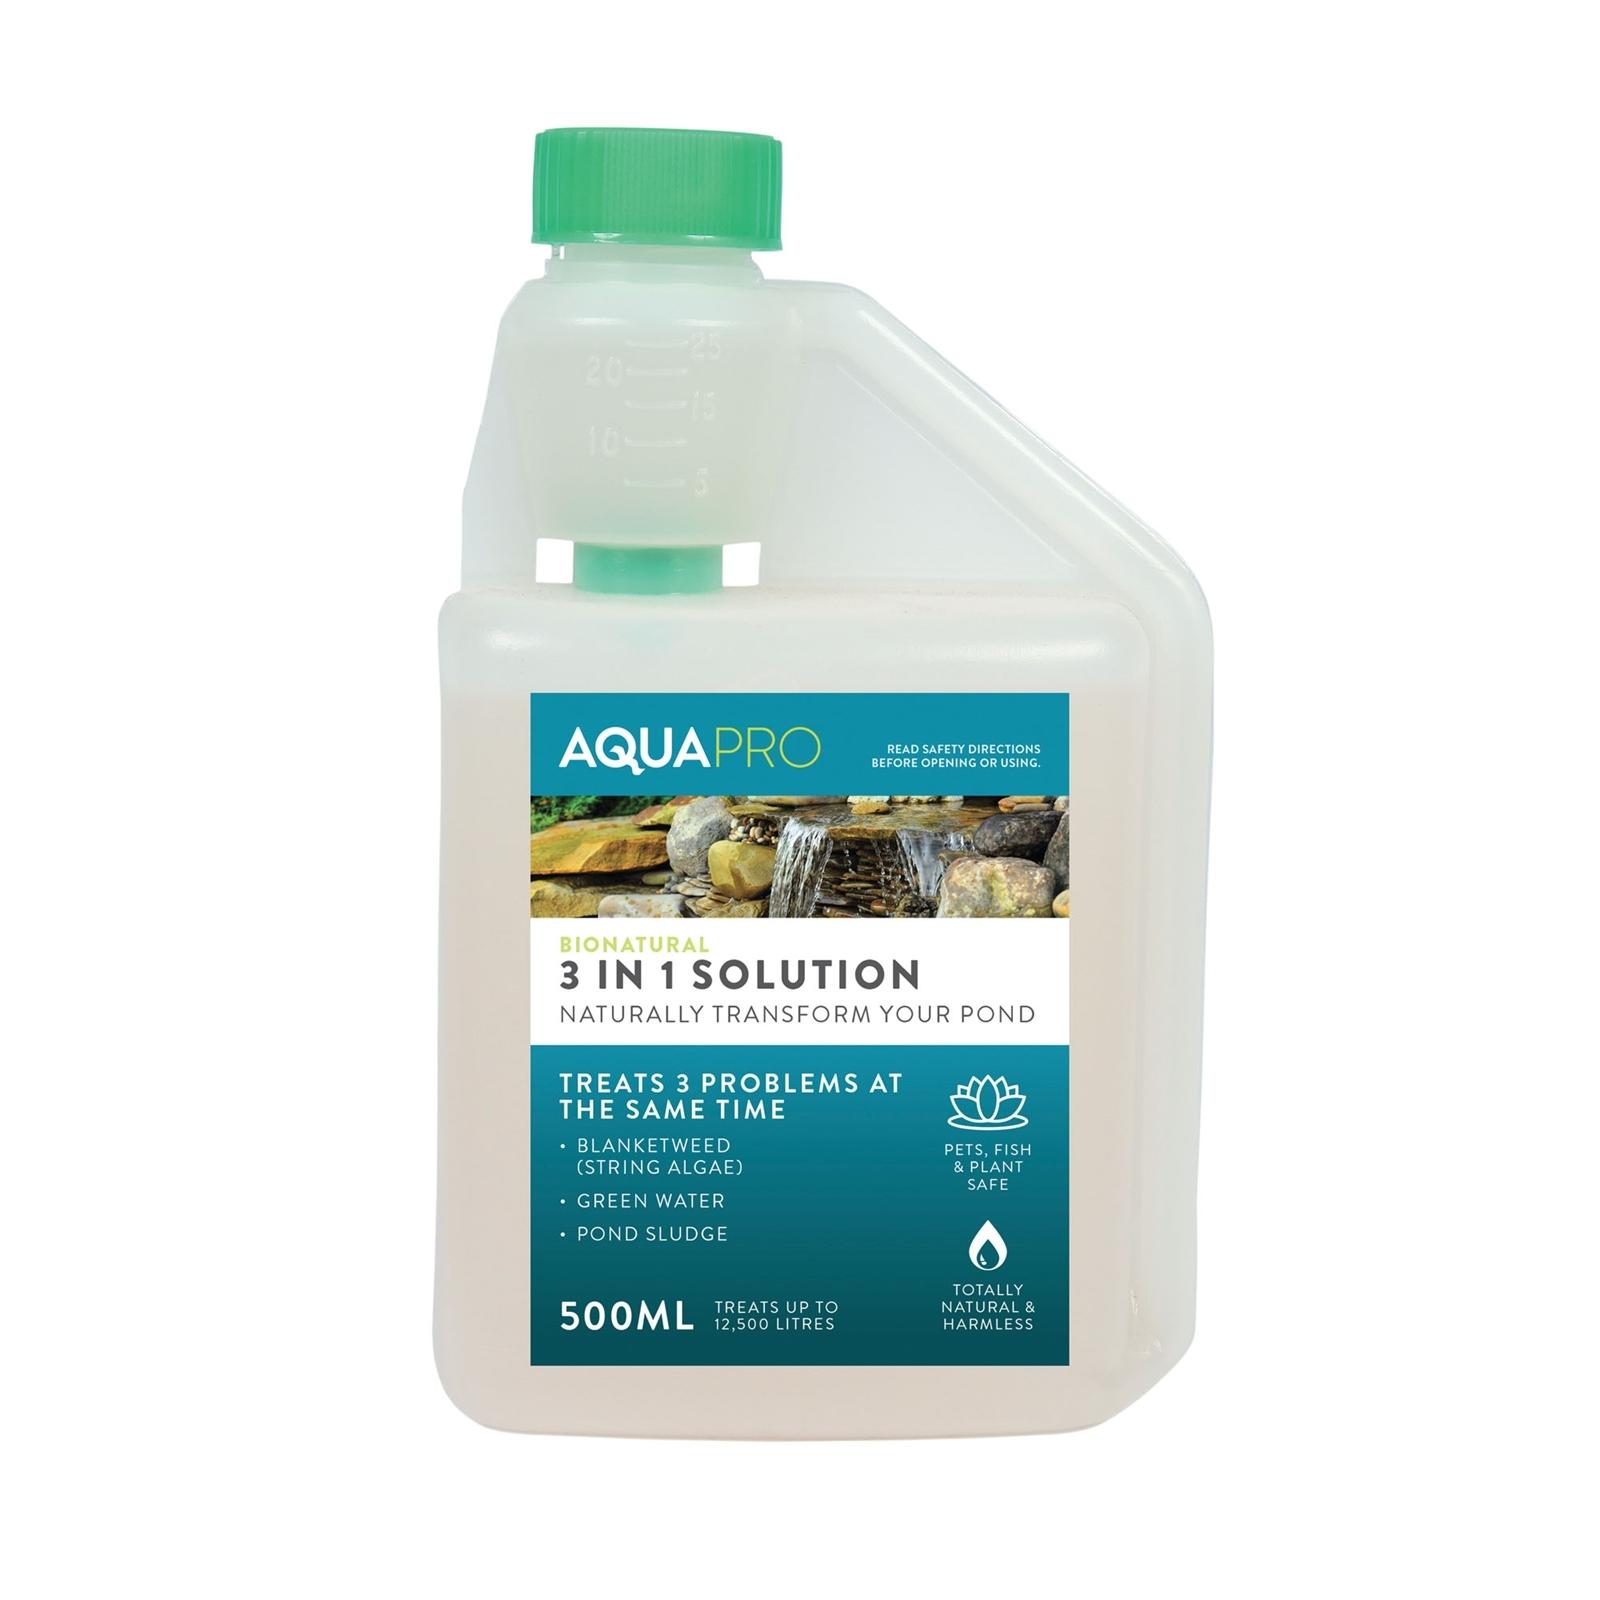 Aquapro 500ml Bionatural 3 In 1 Solution